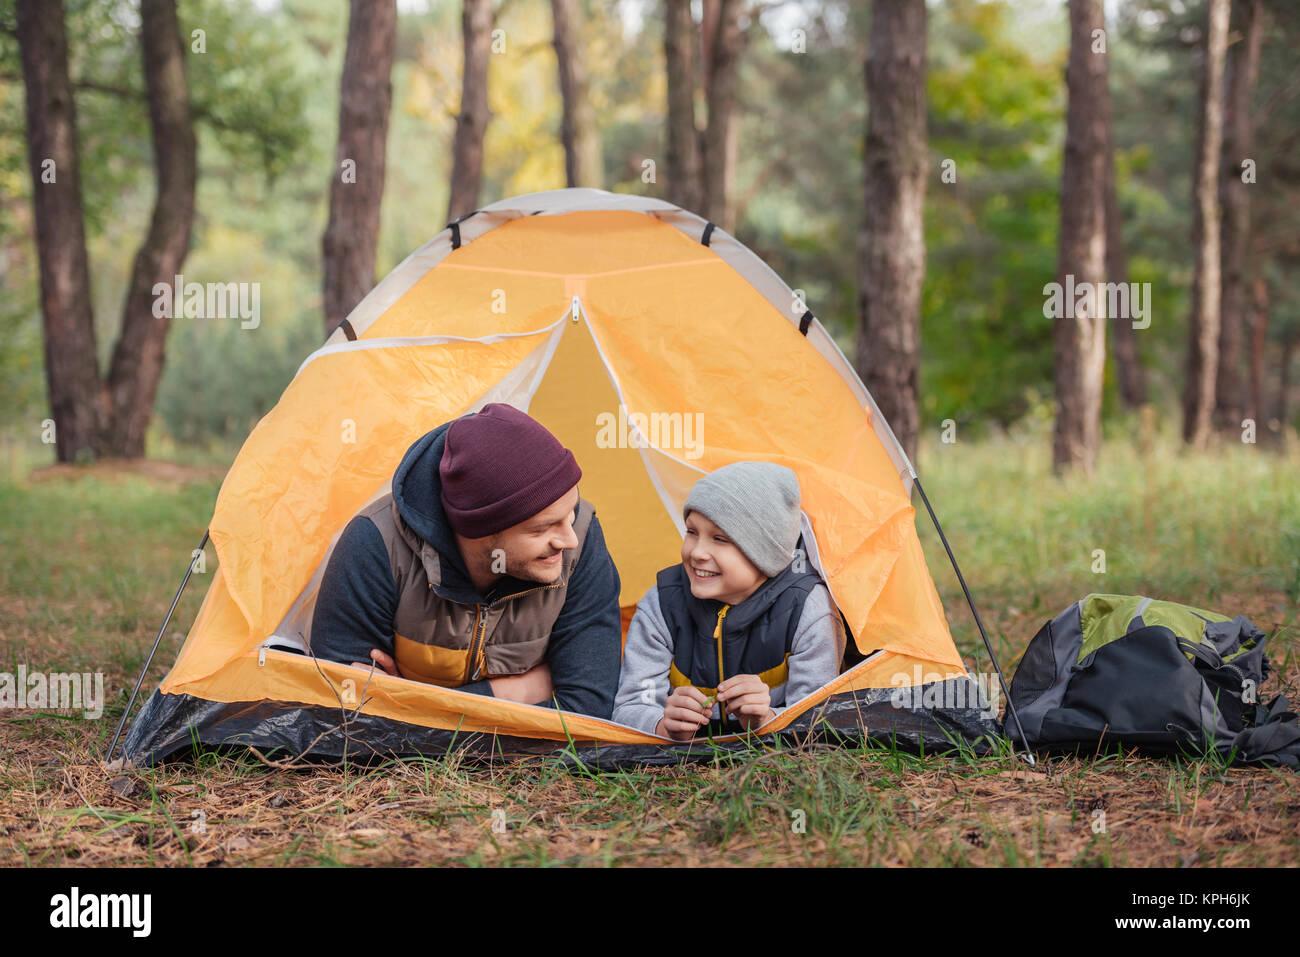 Vater und Sohn liegen im Zelt Stockbild